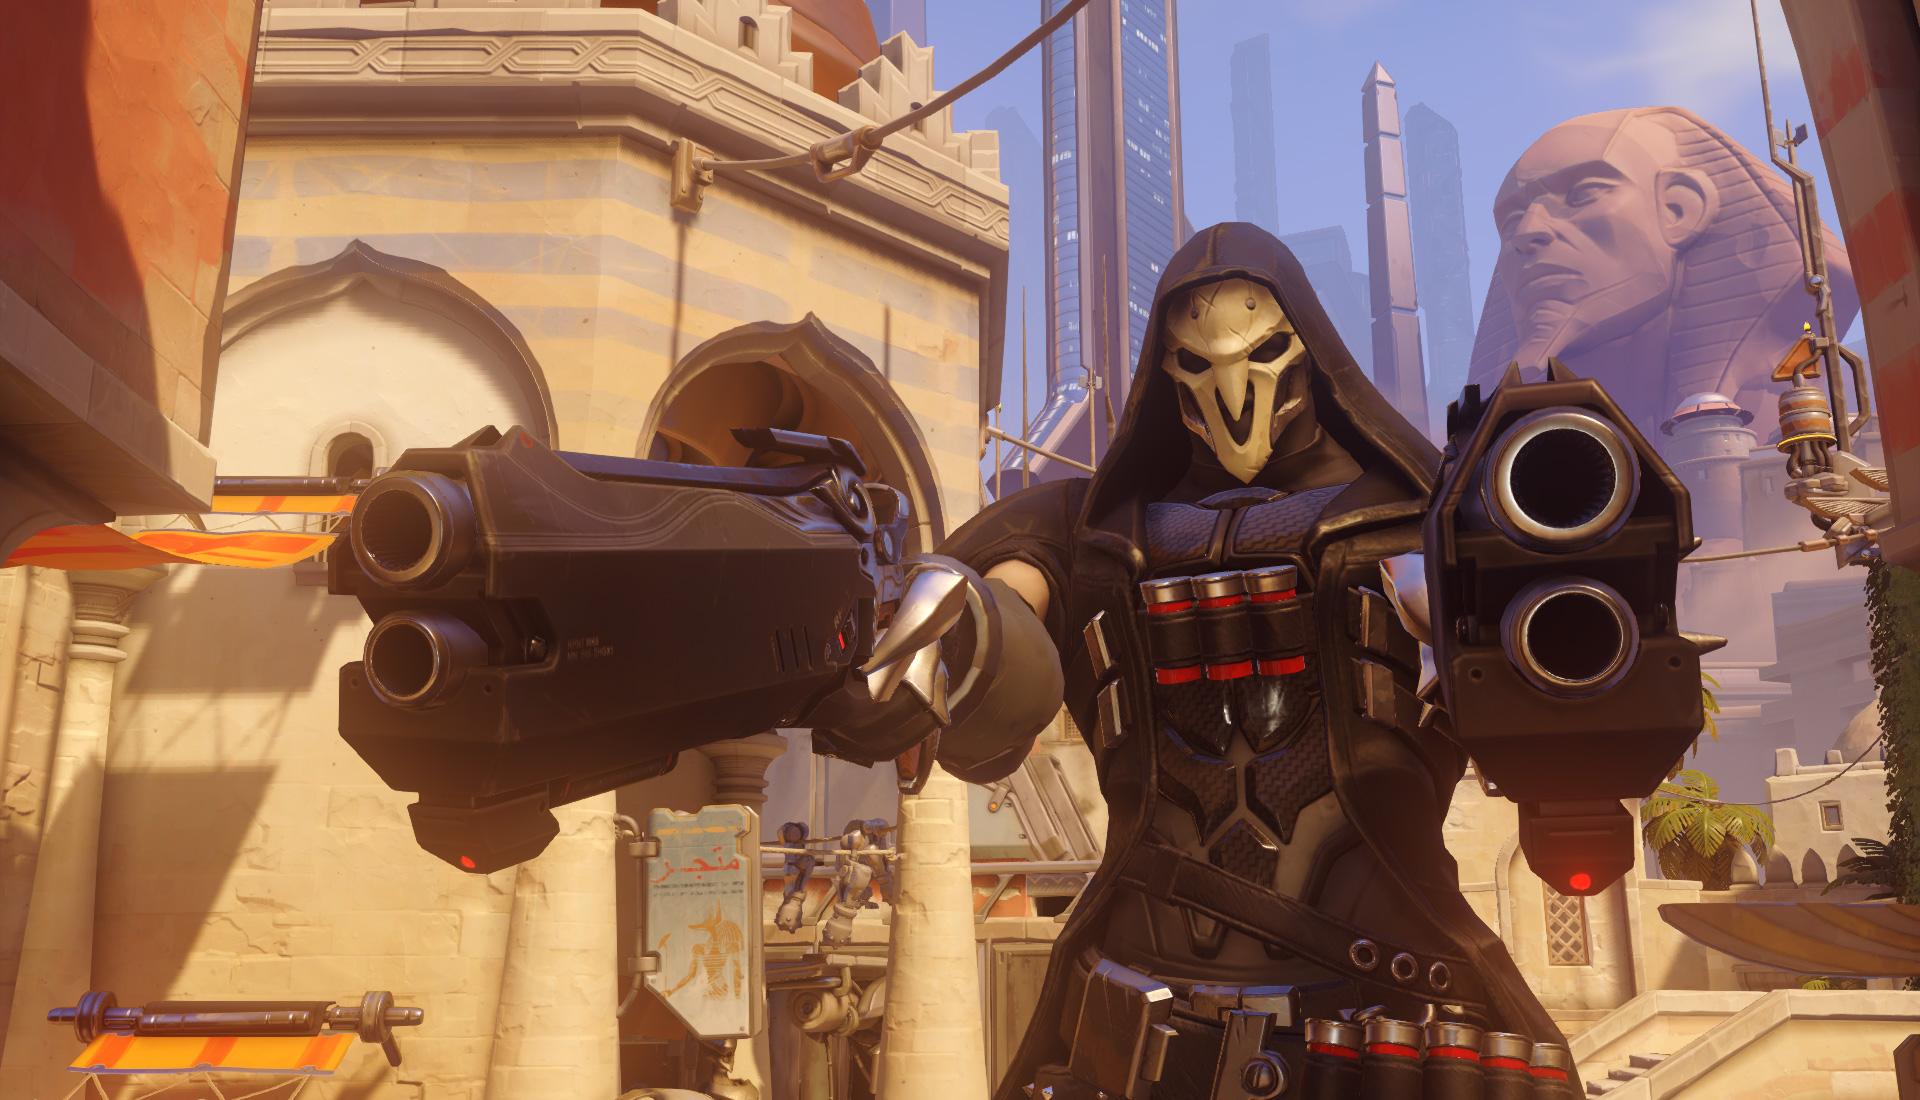 reaper-screenshot-002.jpg